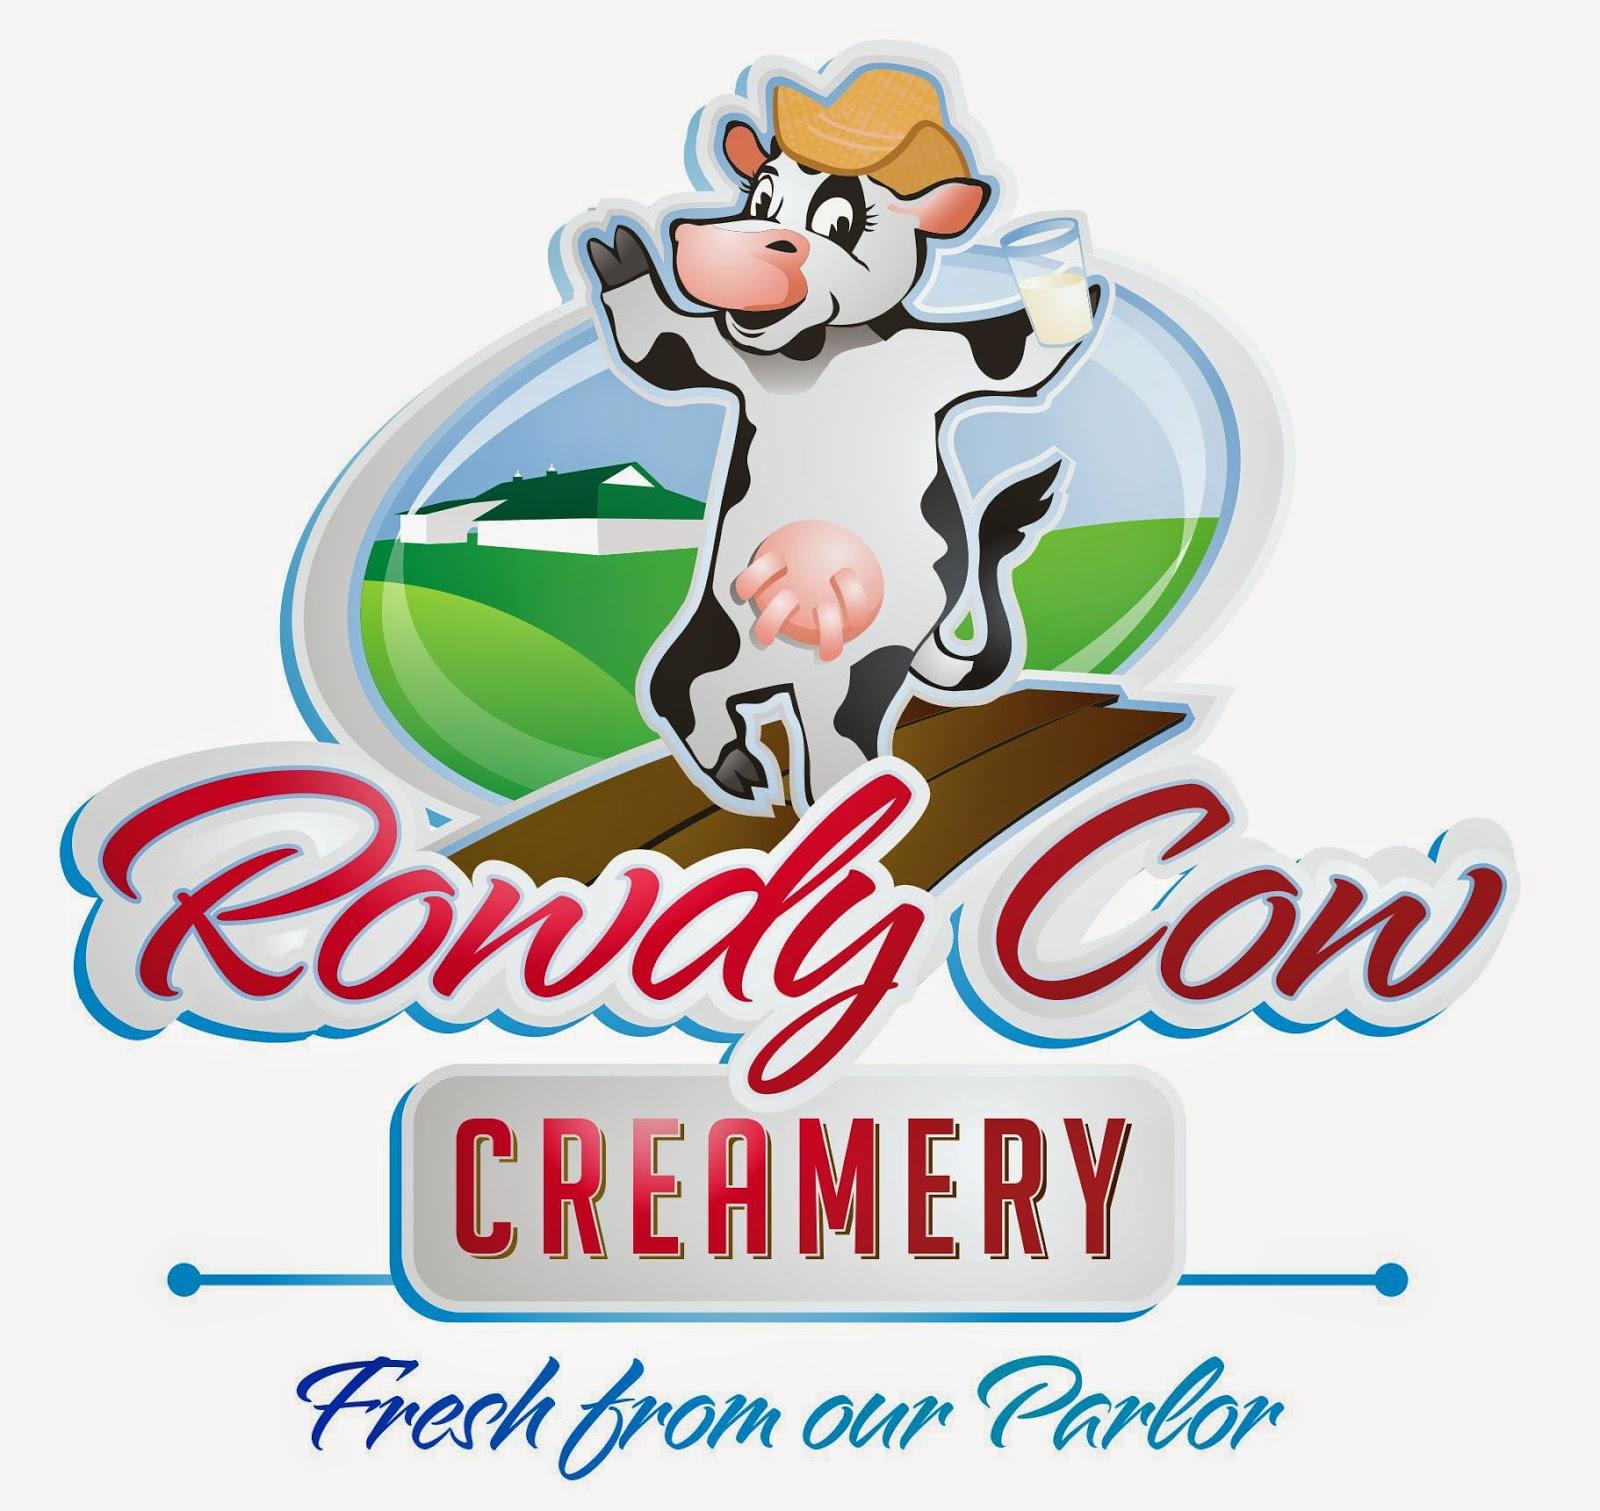 http://hastingsdairy.com/rowdy-cow-creamery.html